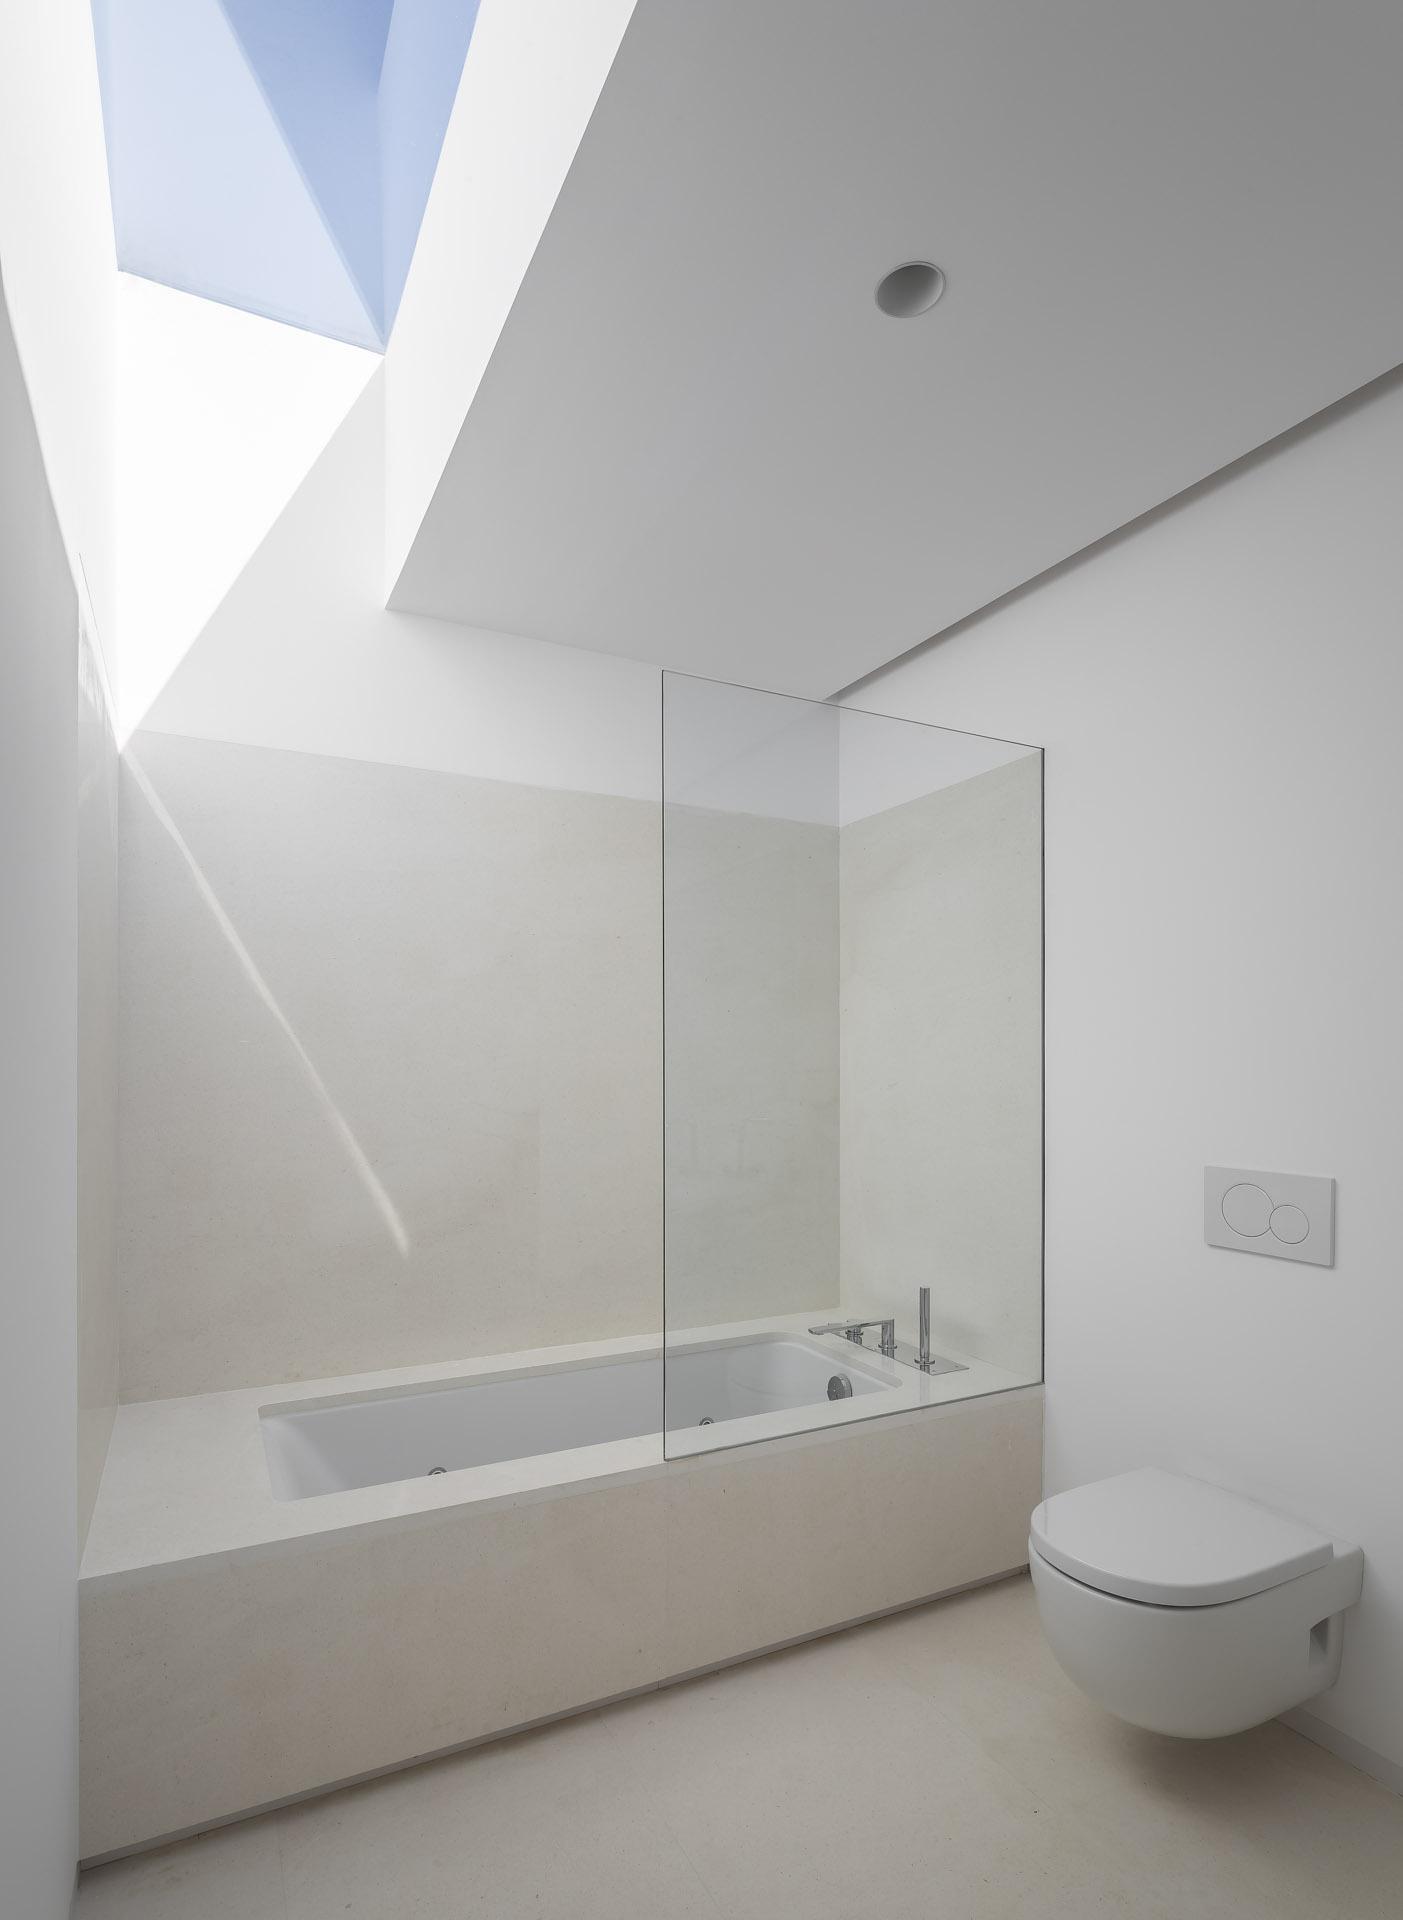 fotografia-arquitectura-valencia-german-cabo-gallardo-llopis-villamarchante-vivienda-28